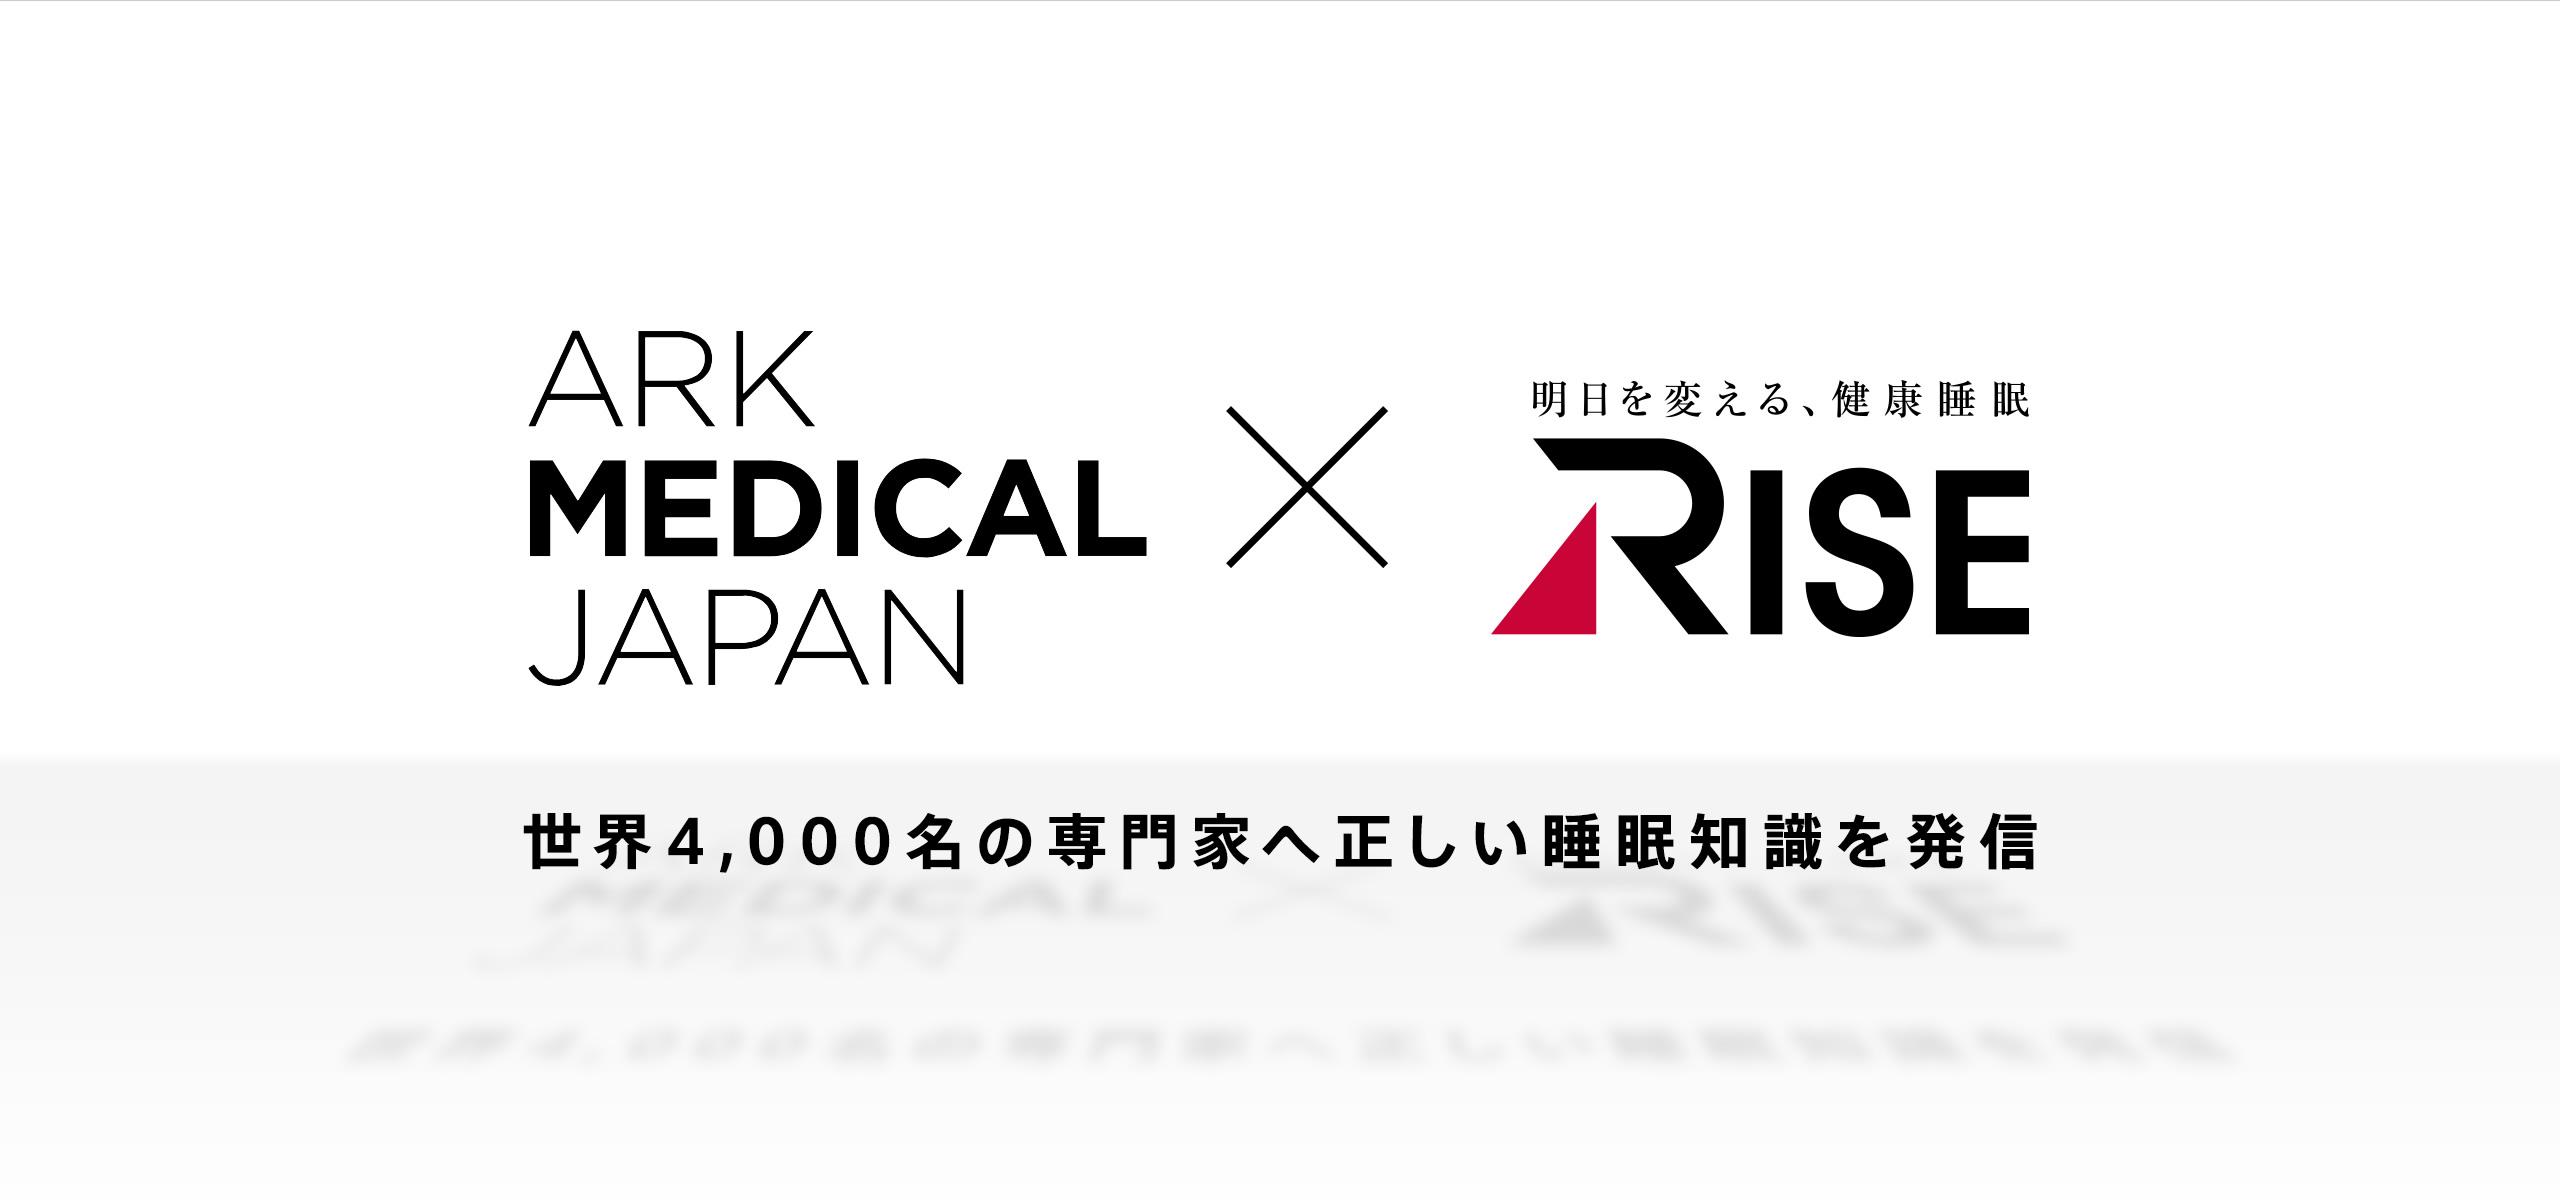 ARK MEDICAL JAPAN × 明日を変える、健康睡眠RISE 世界4,000名の専門家へ正しい睡眠知識を発信